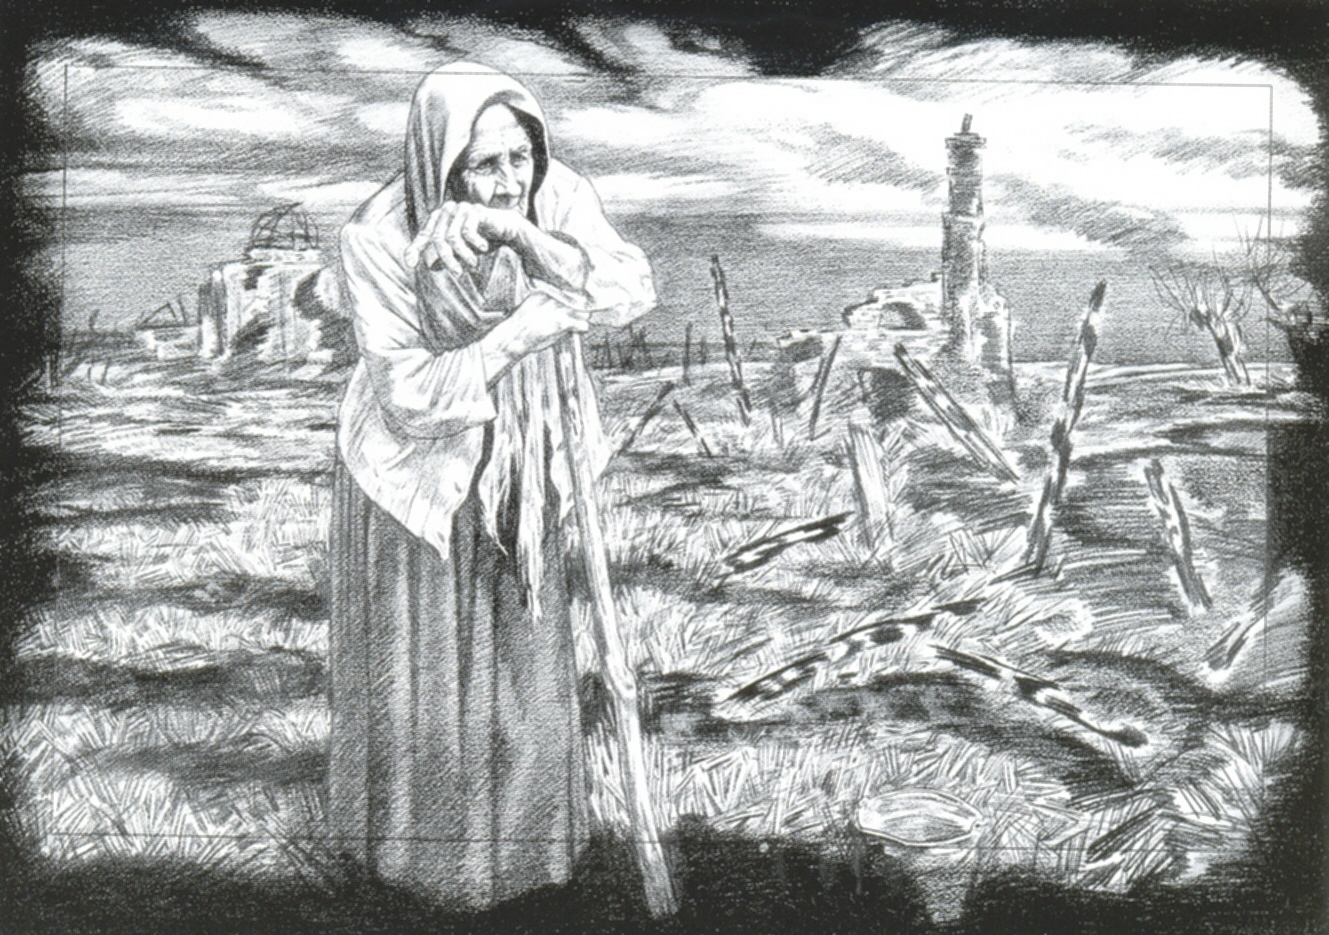 Косенков Станислав. На пепелище.